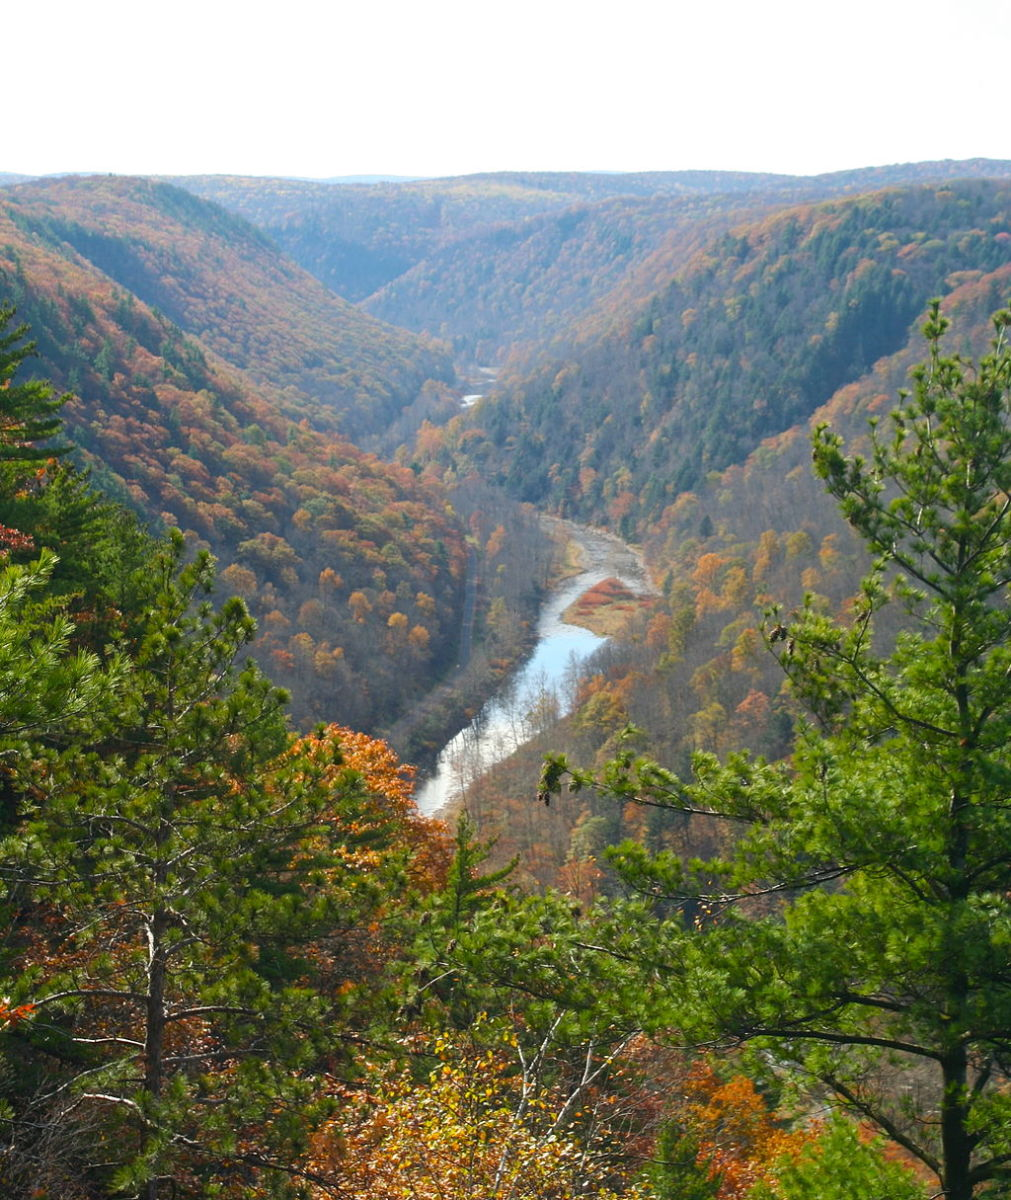 Pine Creek Gorge, the Grand Canyon of Pennsylvania